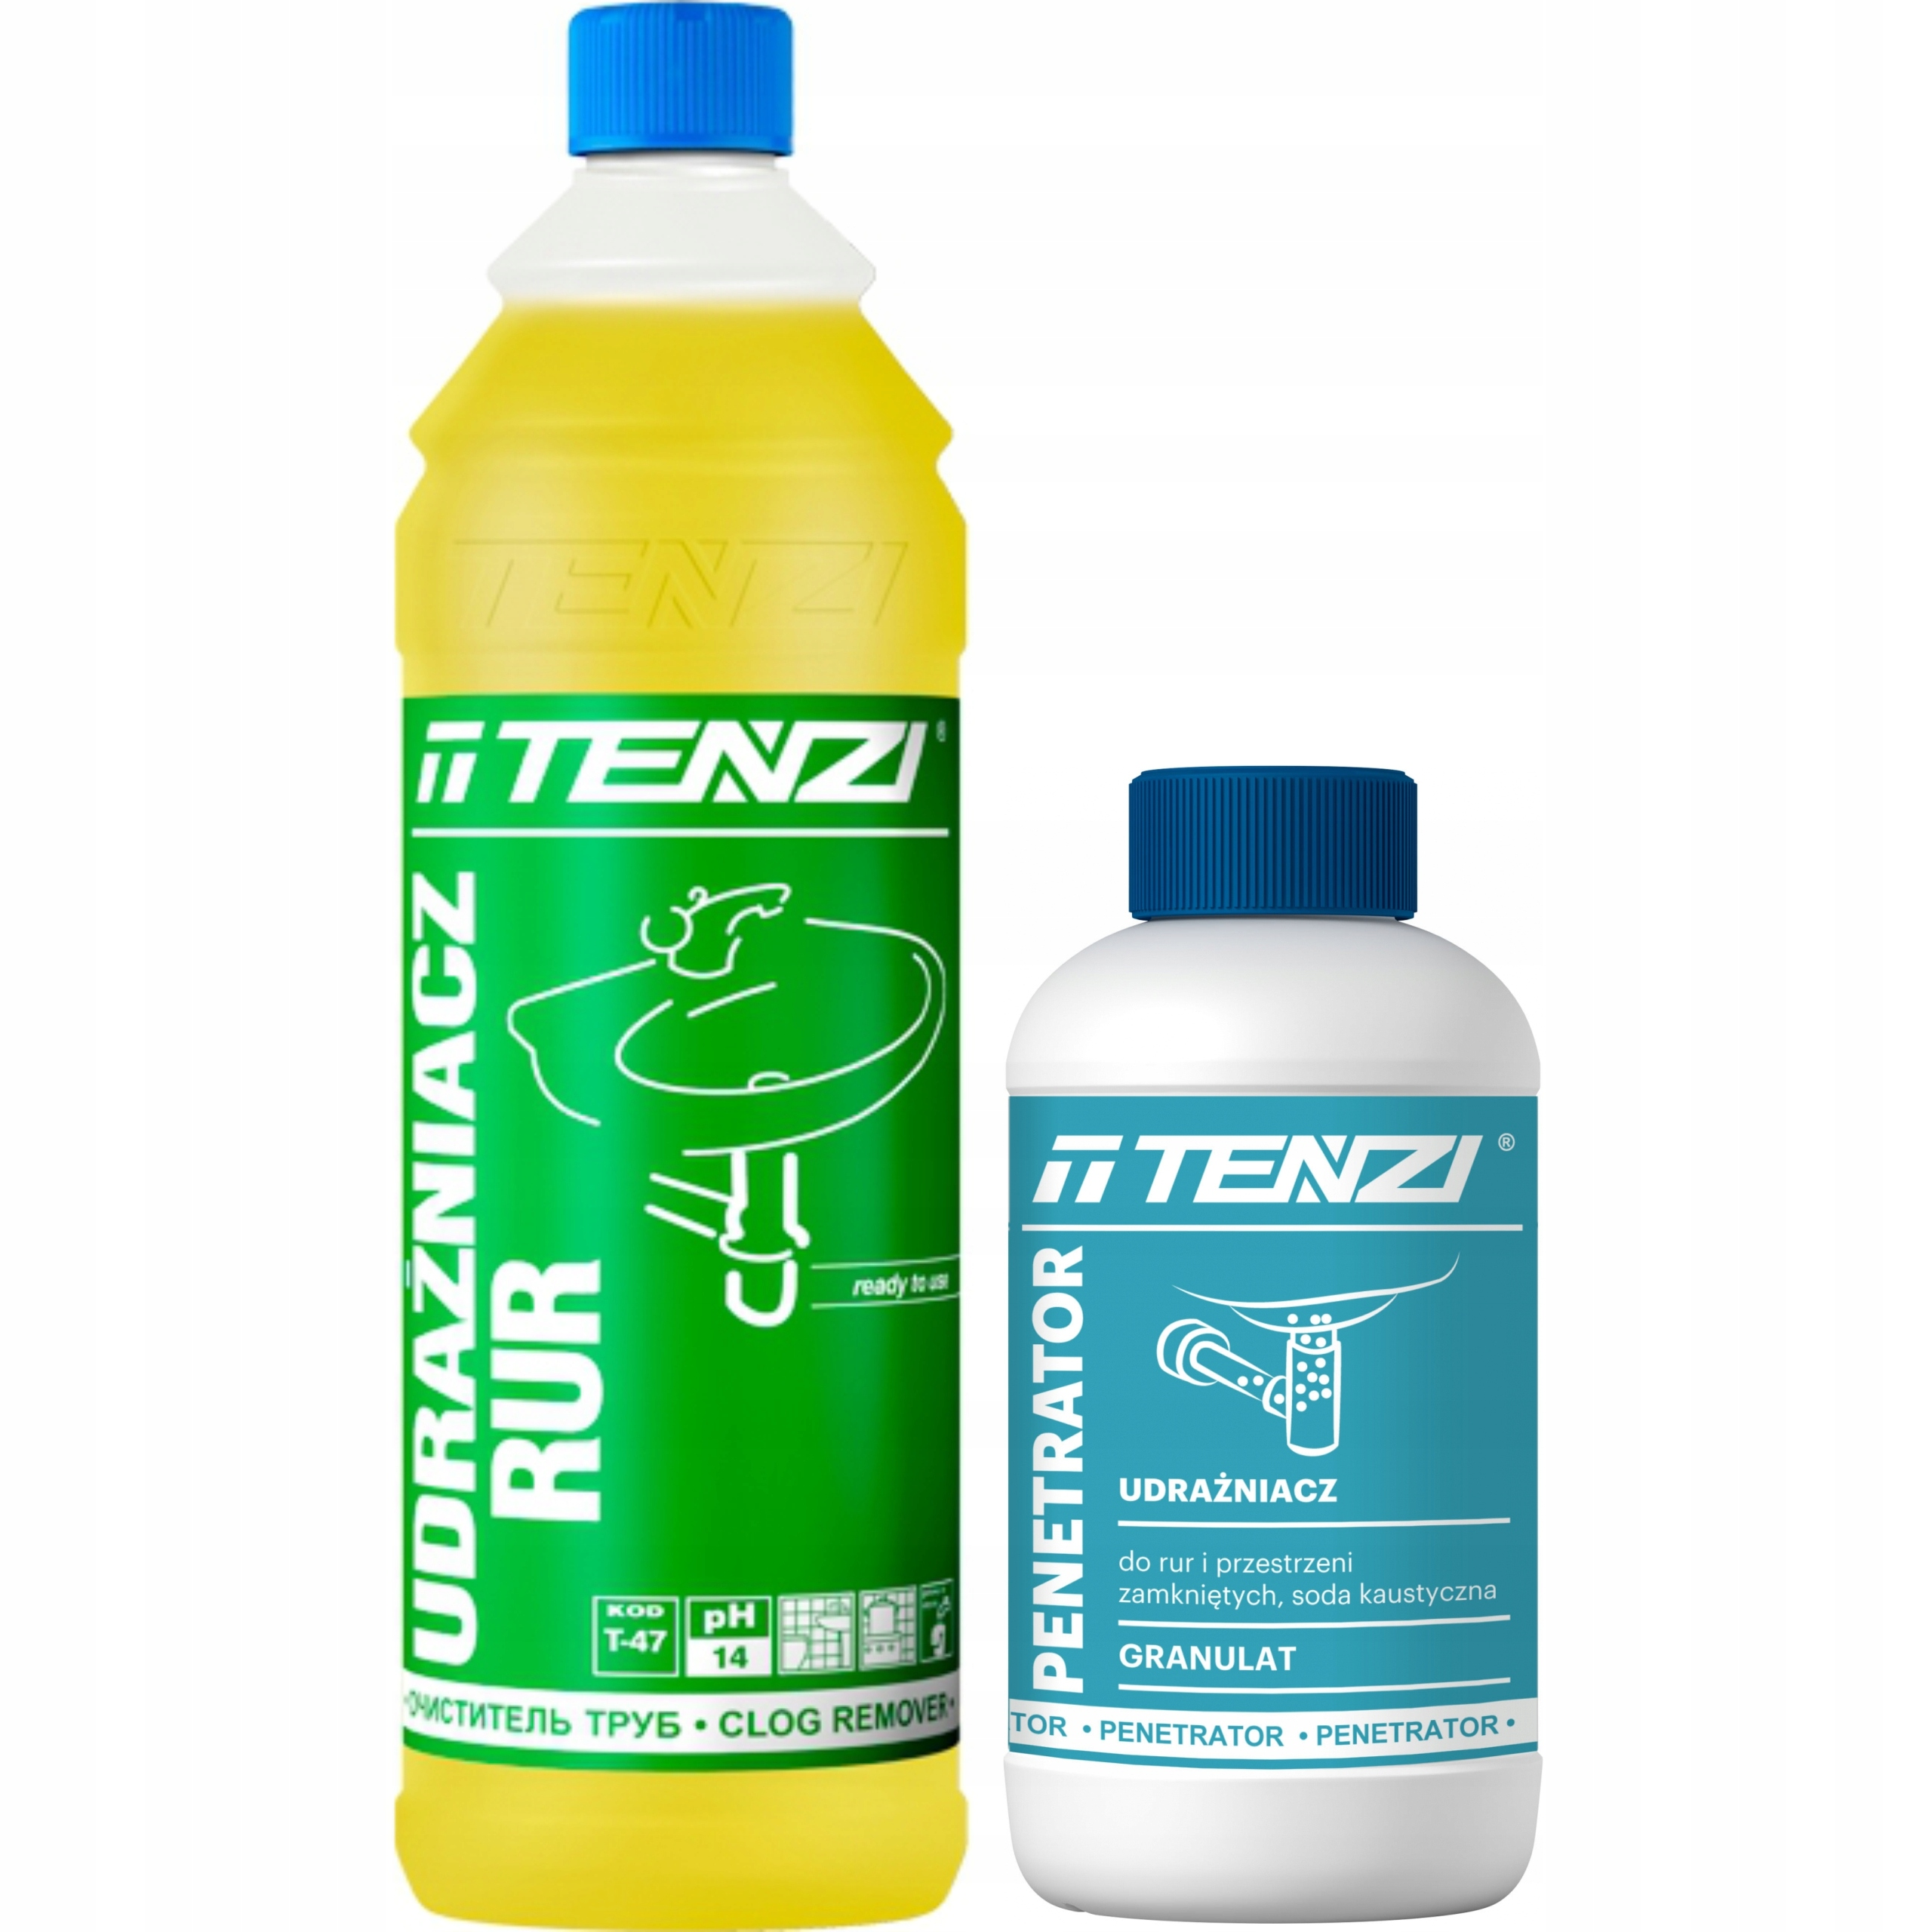 Комплект для чистки канализации Tenzi